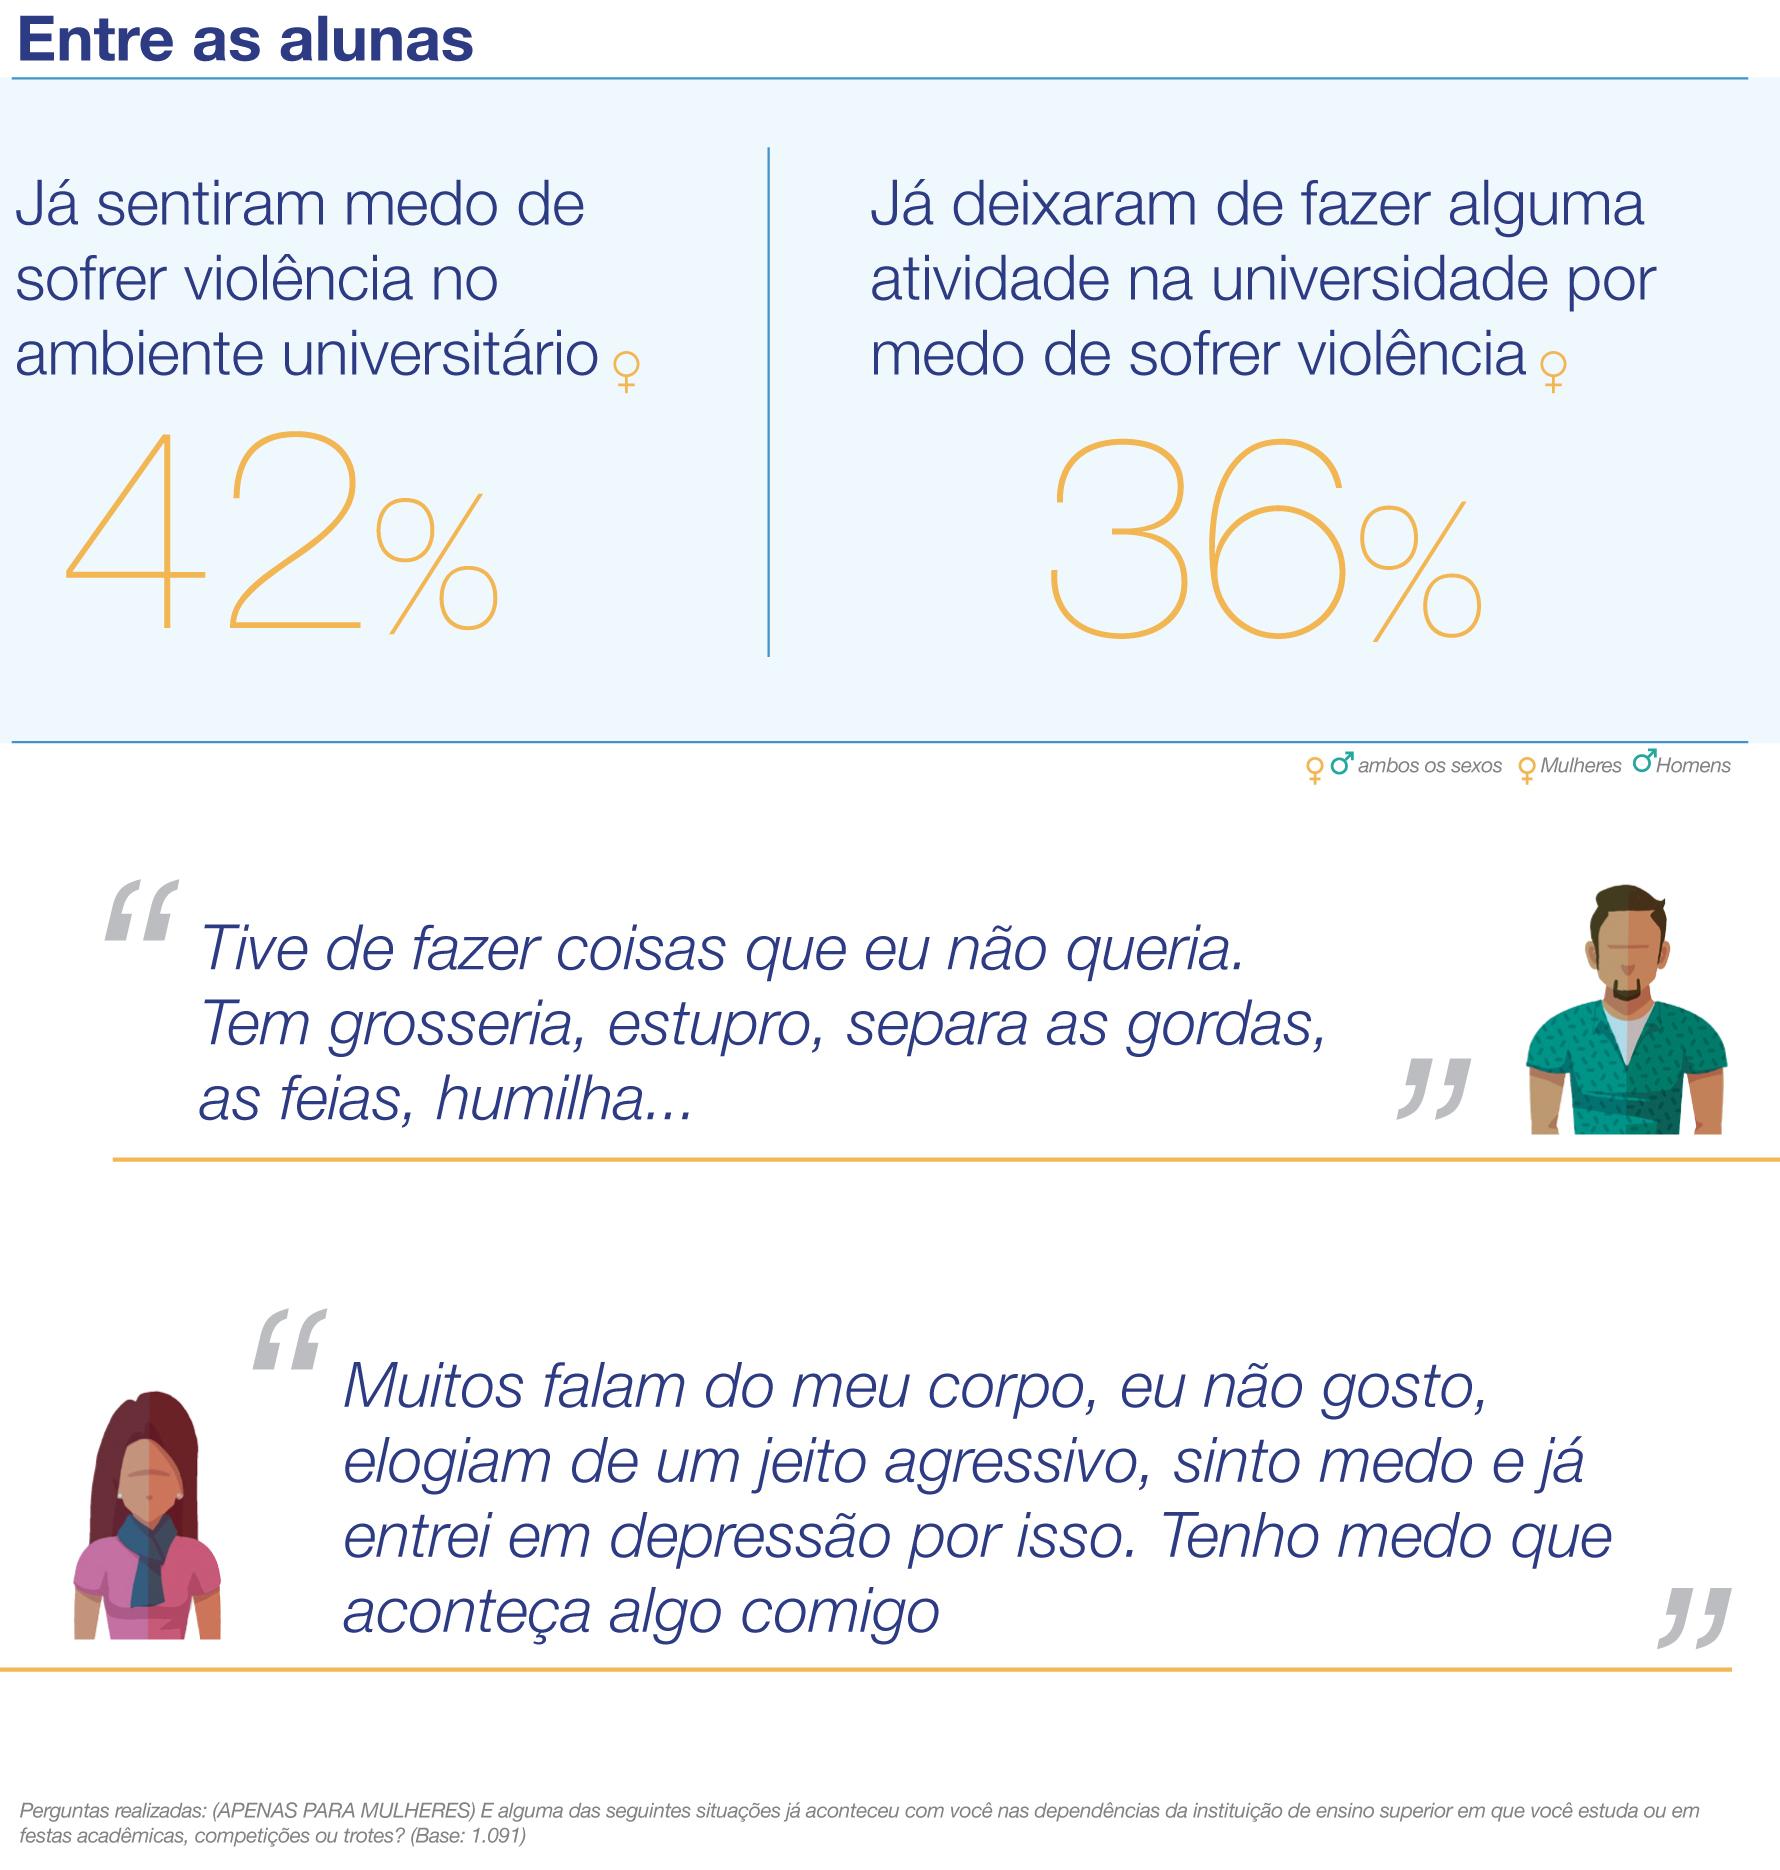 DATAPOPULAR_AVON_violenciauniversitarios2015-3